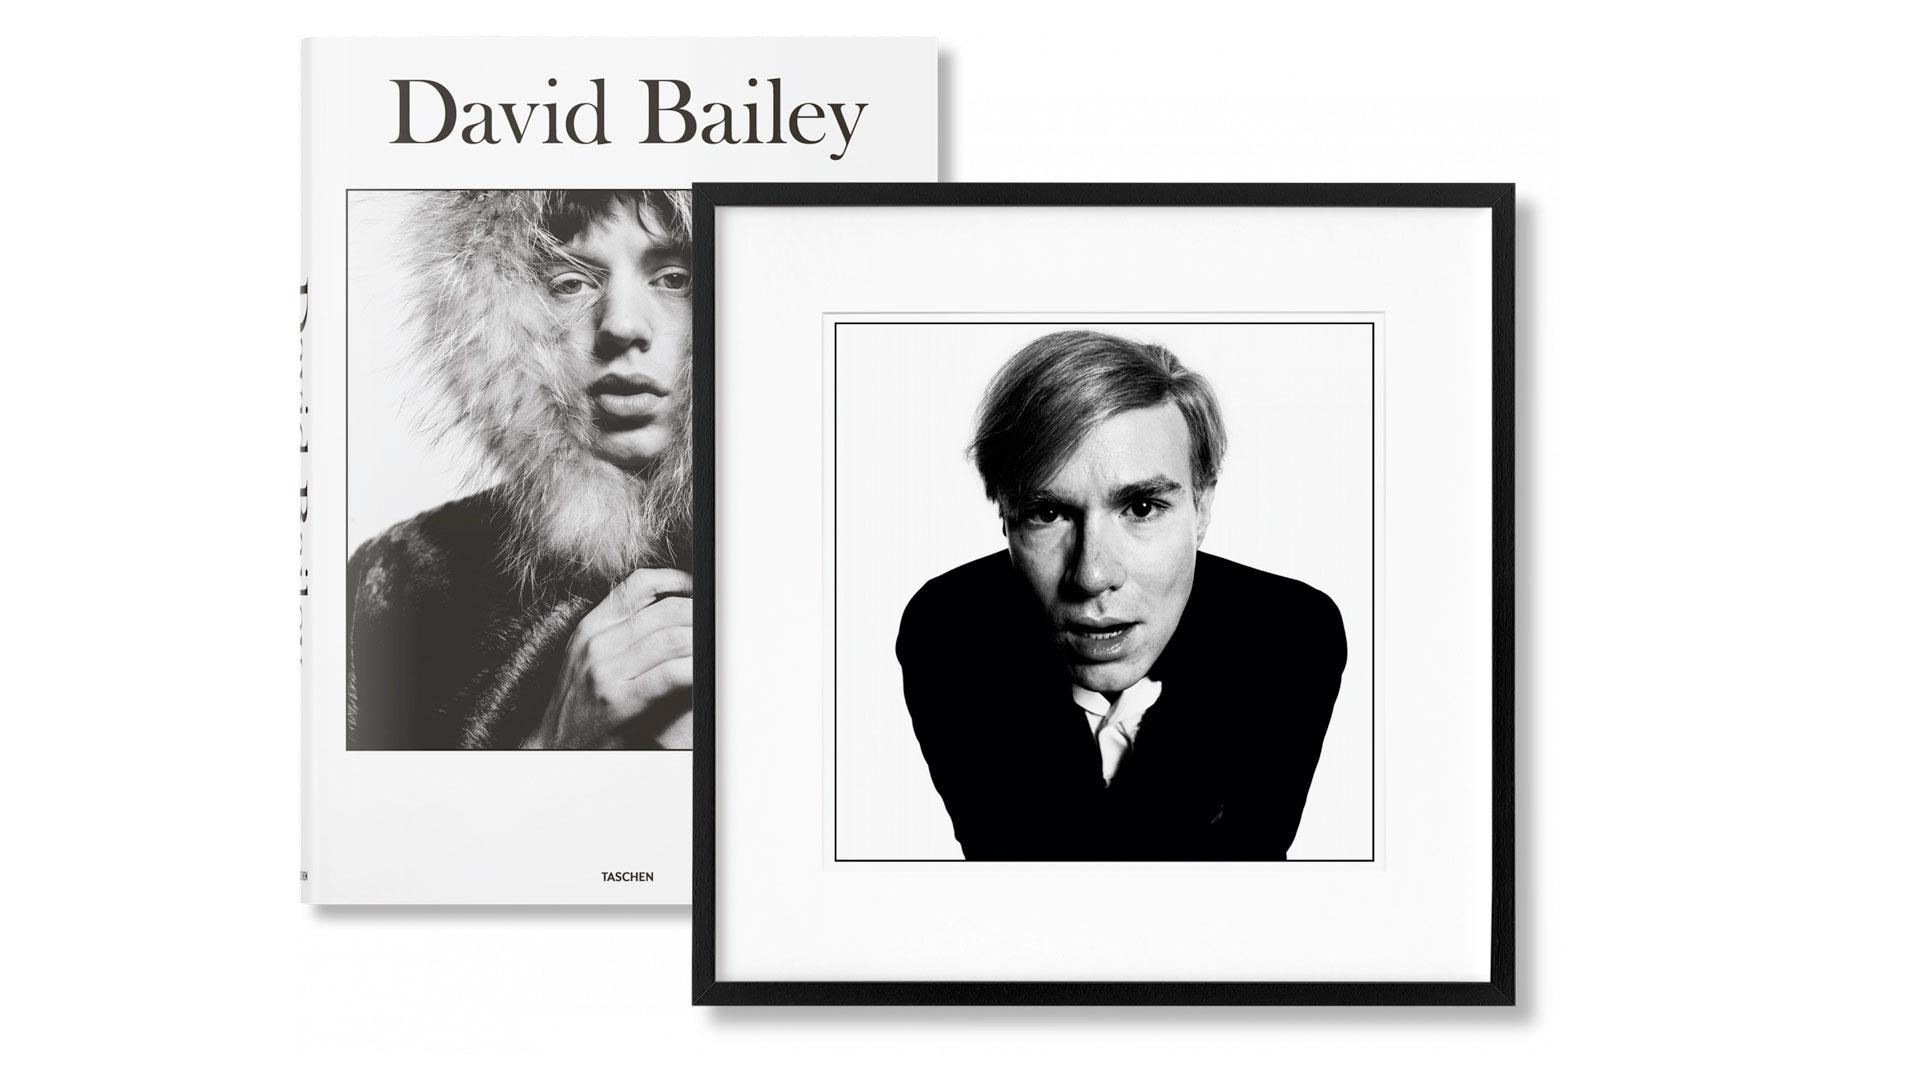 David Bailey bien merece un Sumo hero asset